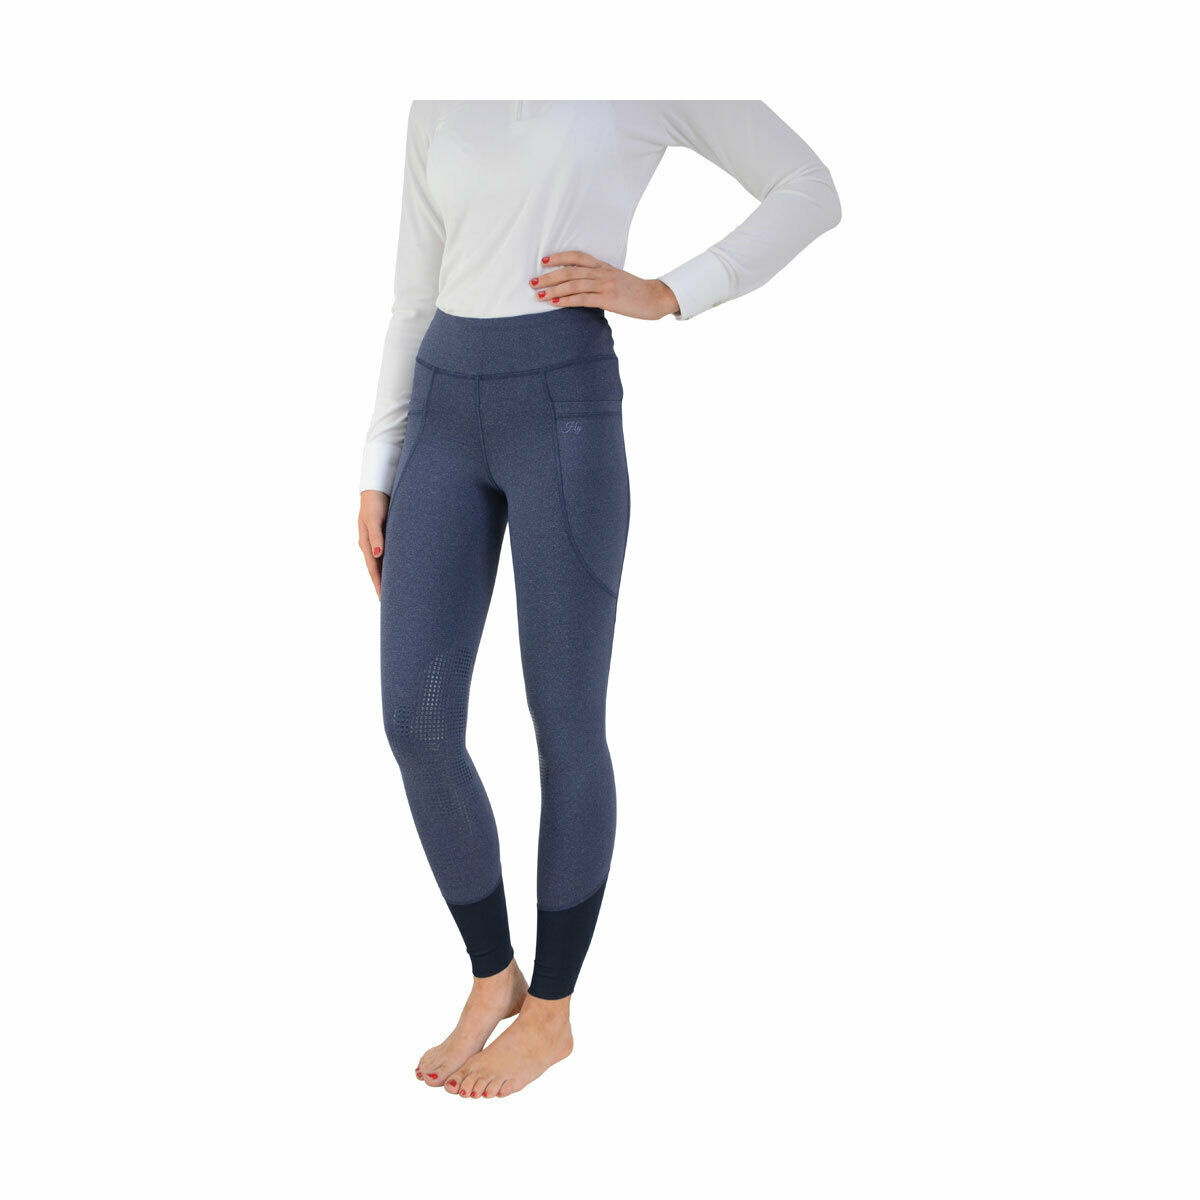 HY Performance Donna Cartmel Riding Skins Leggings Collant Blu Melange XSXL